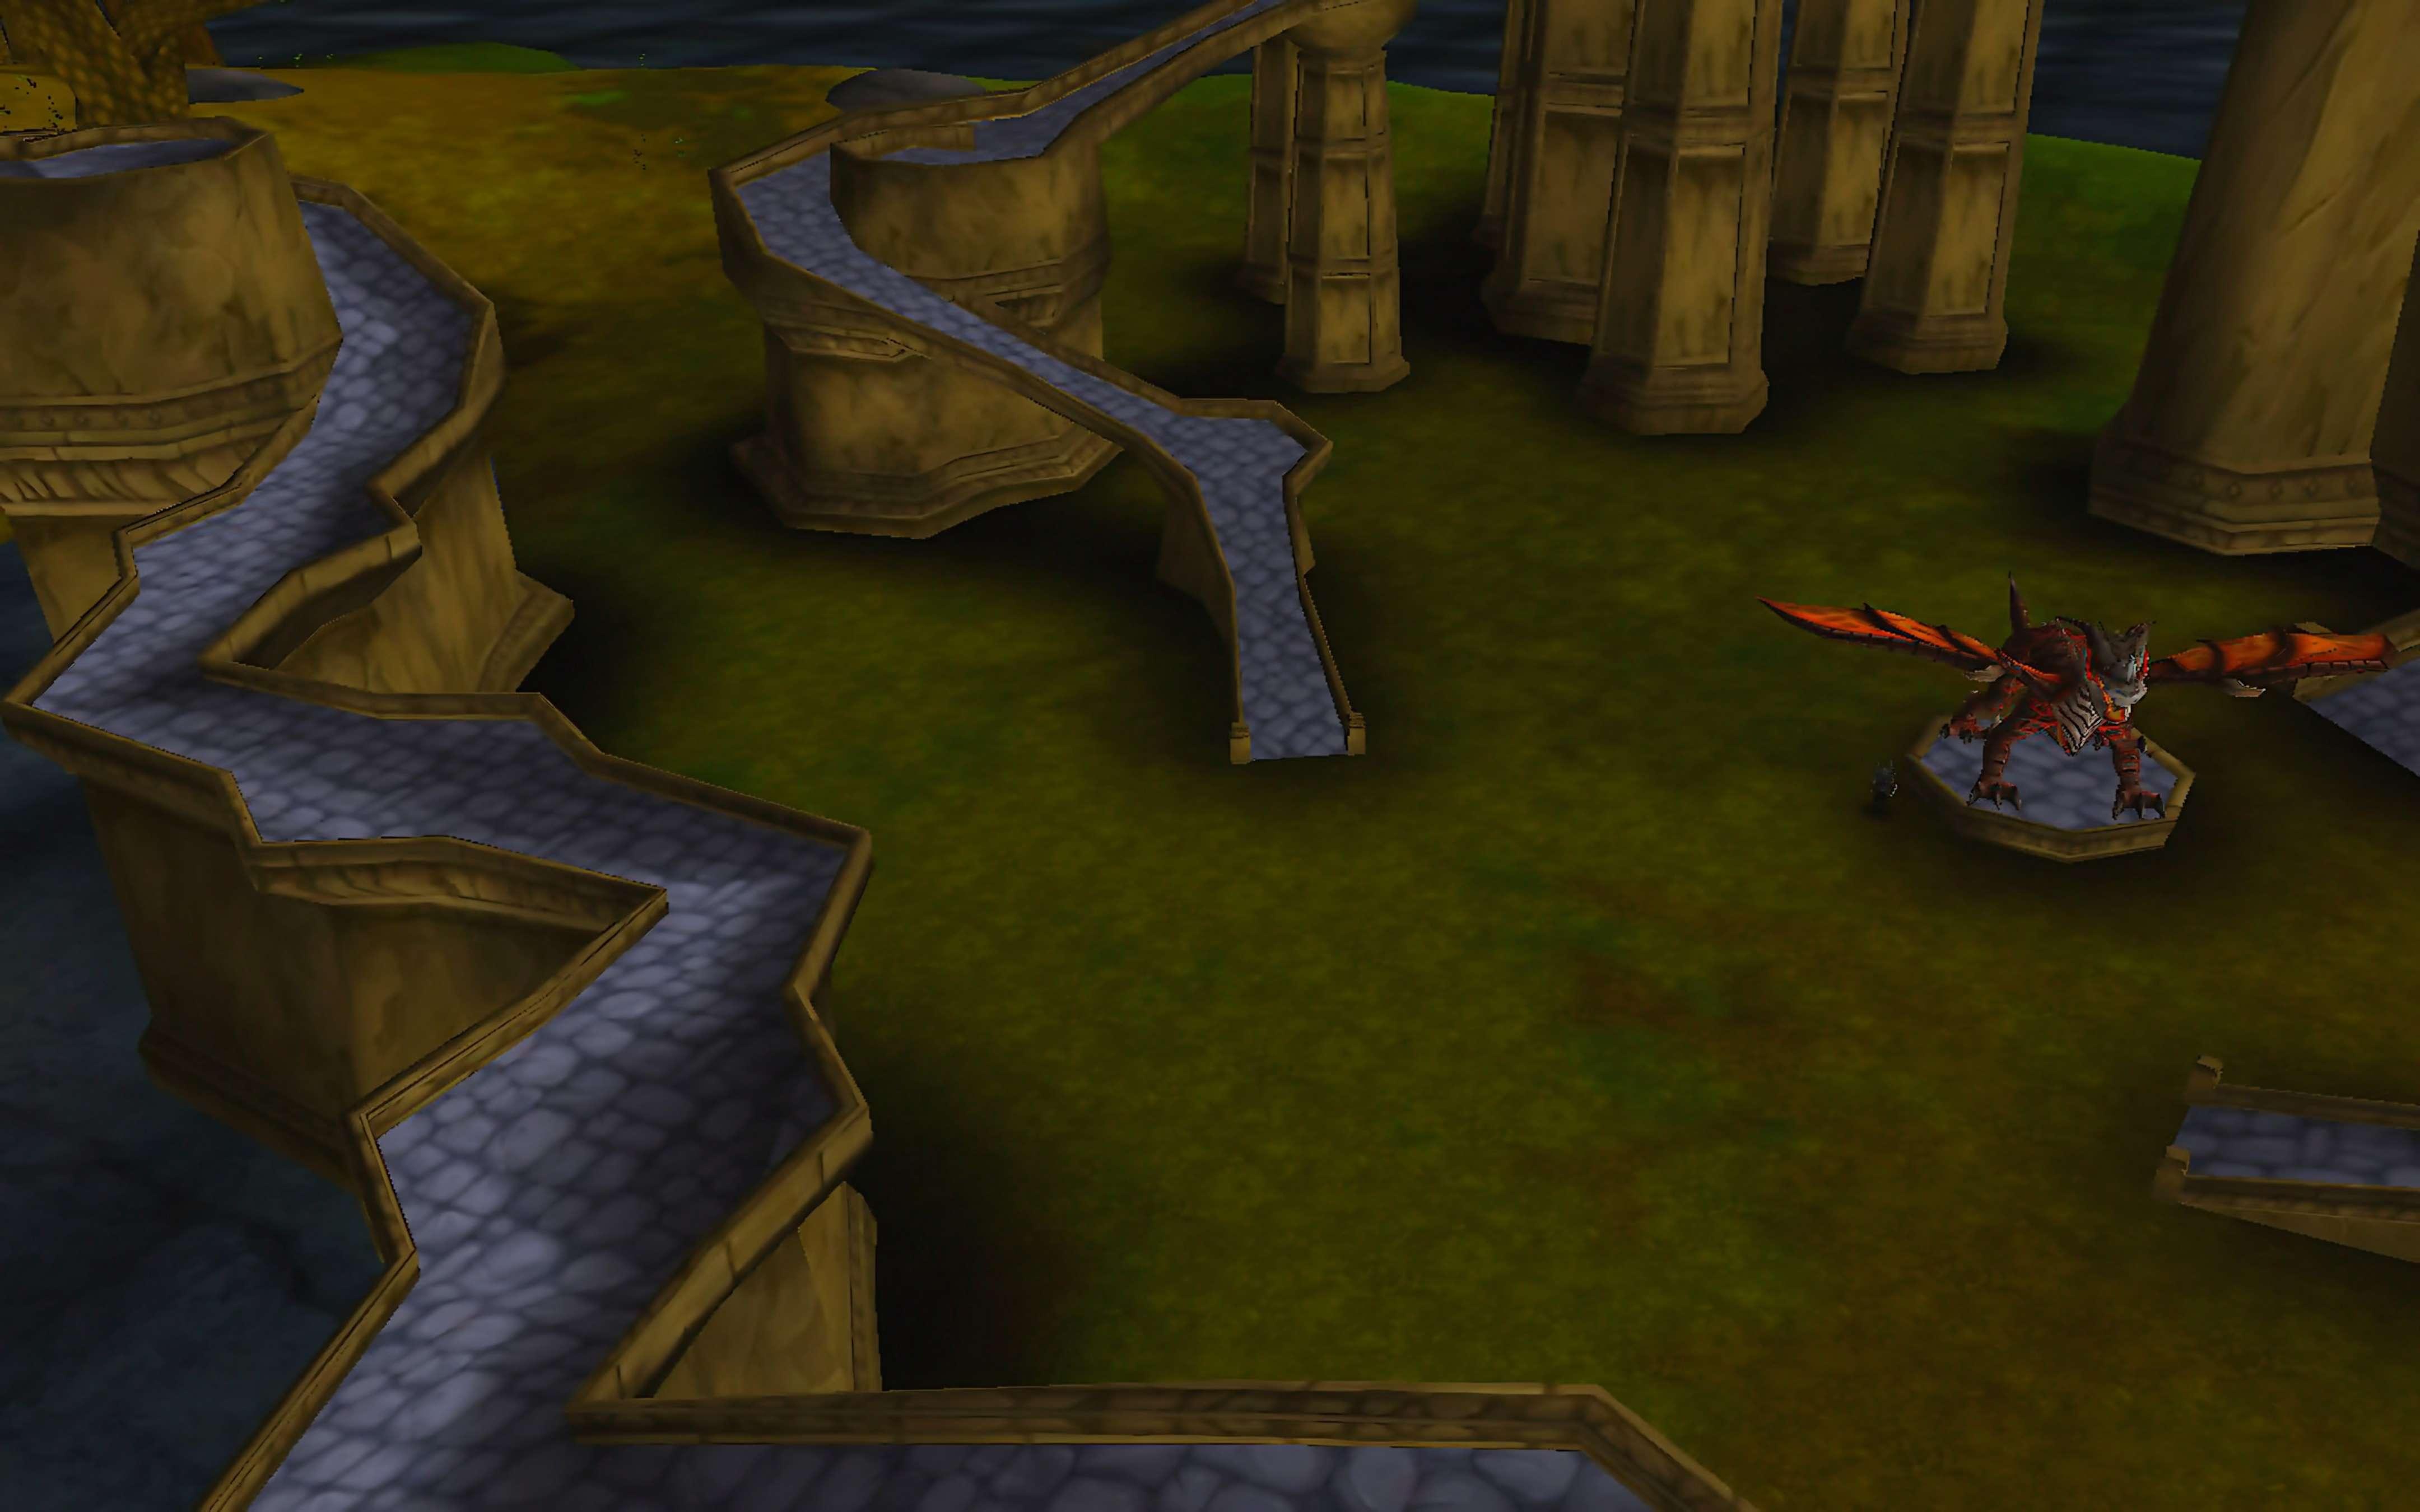 Maidmarian. Com launches sherwood dungeon mmorpg into open beta.